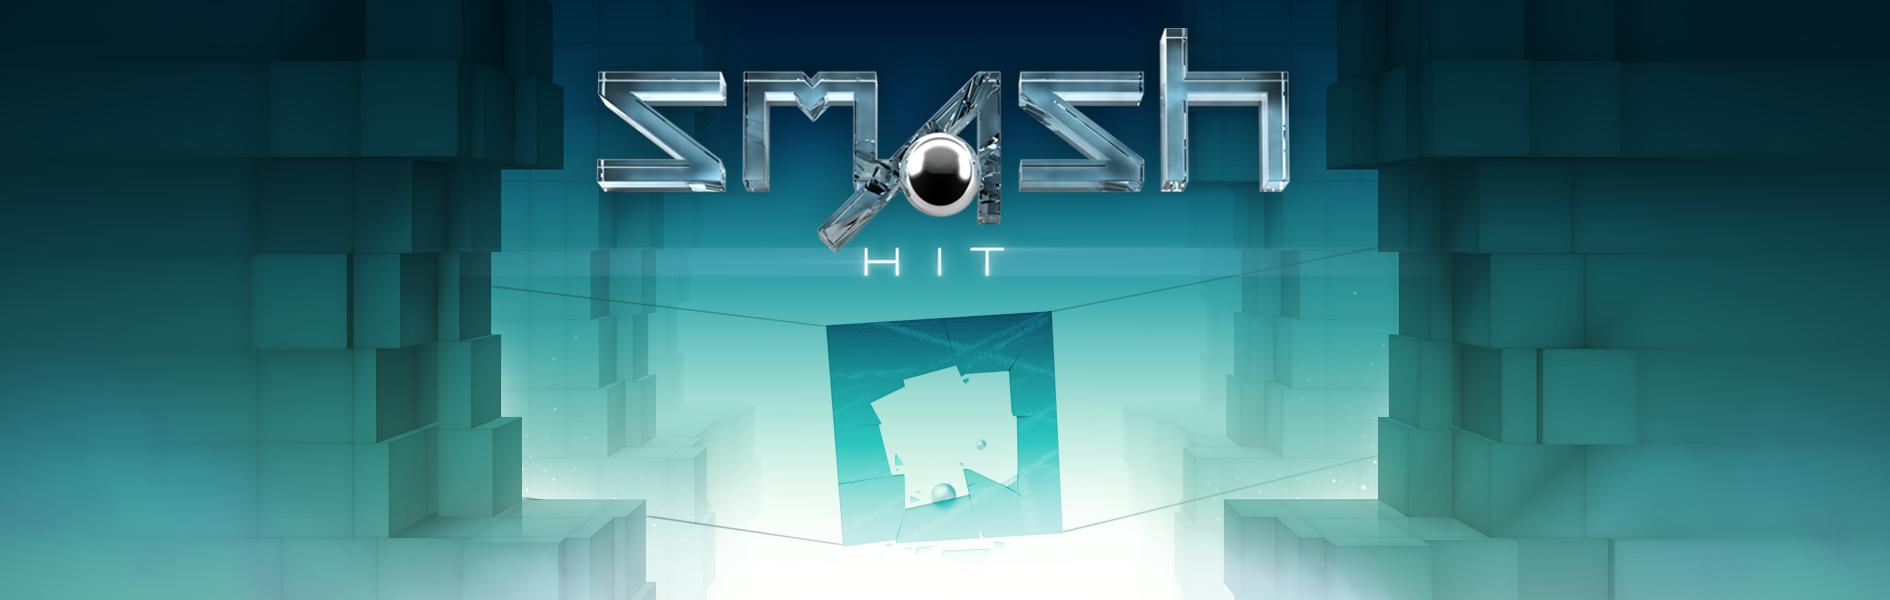 smash-hit-artwork2.png